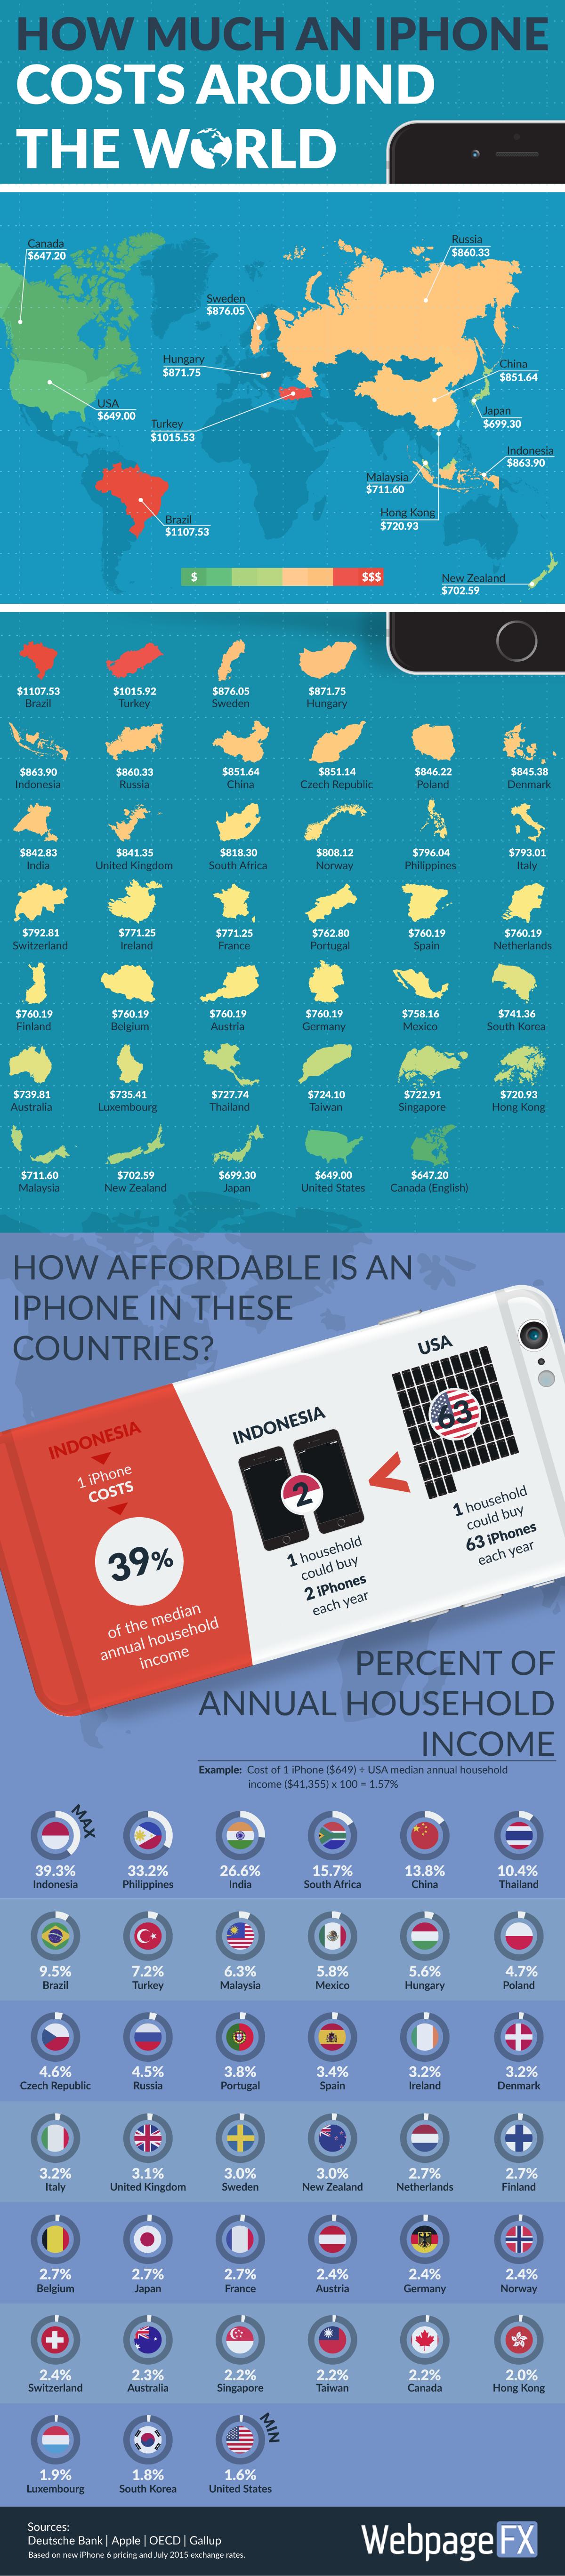 iPhone cost around the world